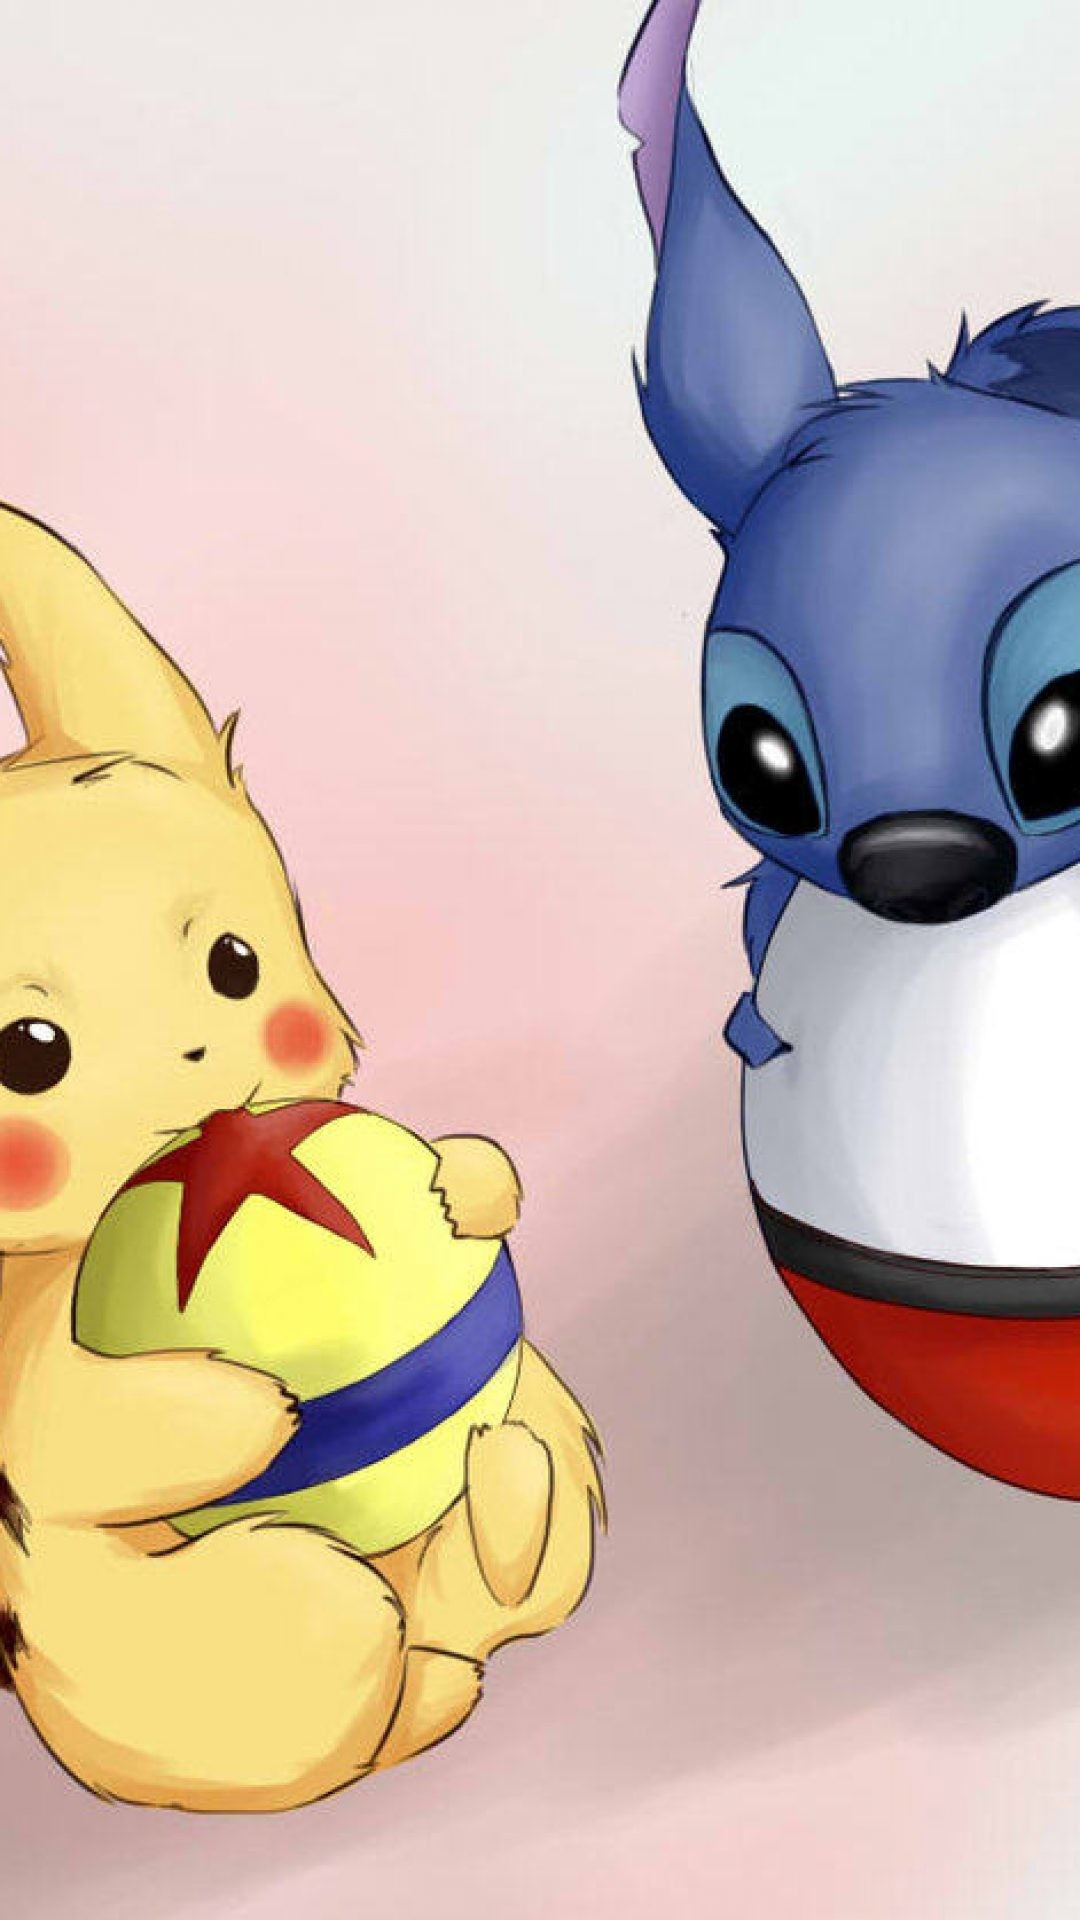 Pikachu Iphone Wallpaper 84 Images